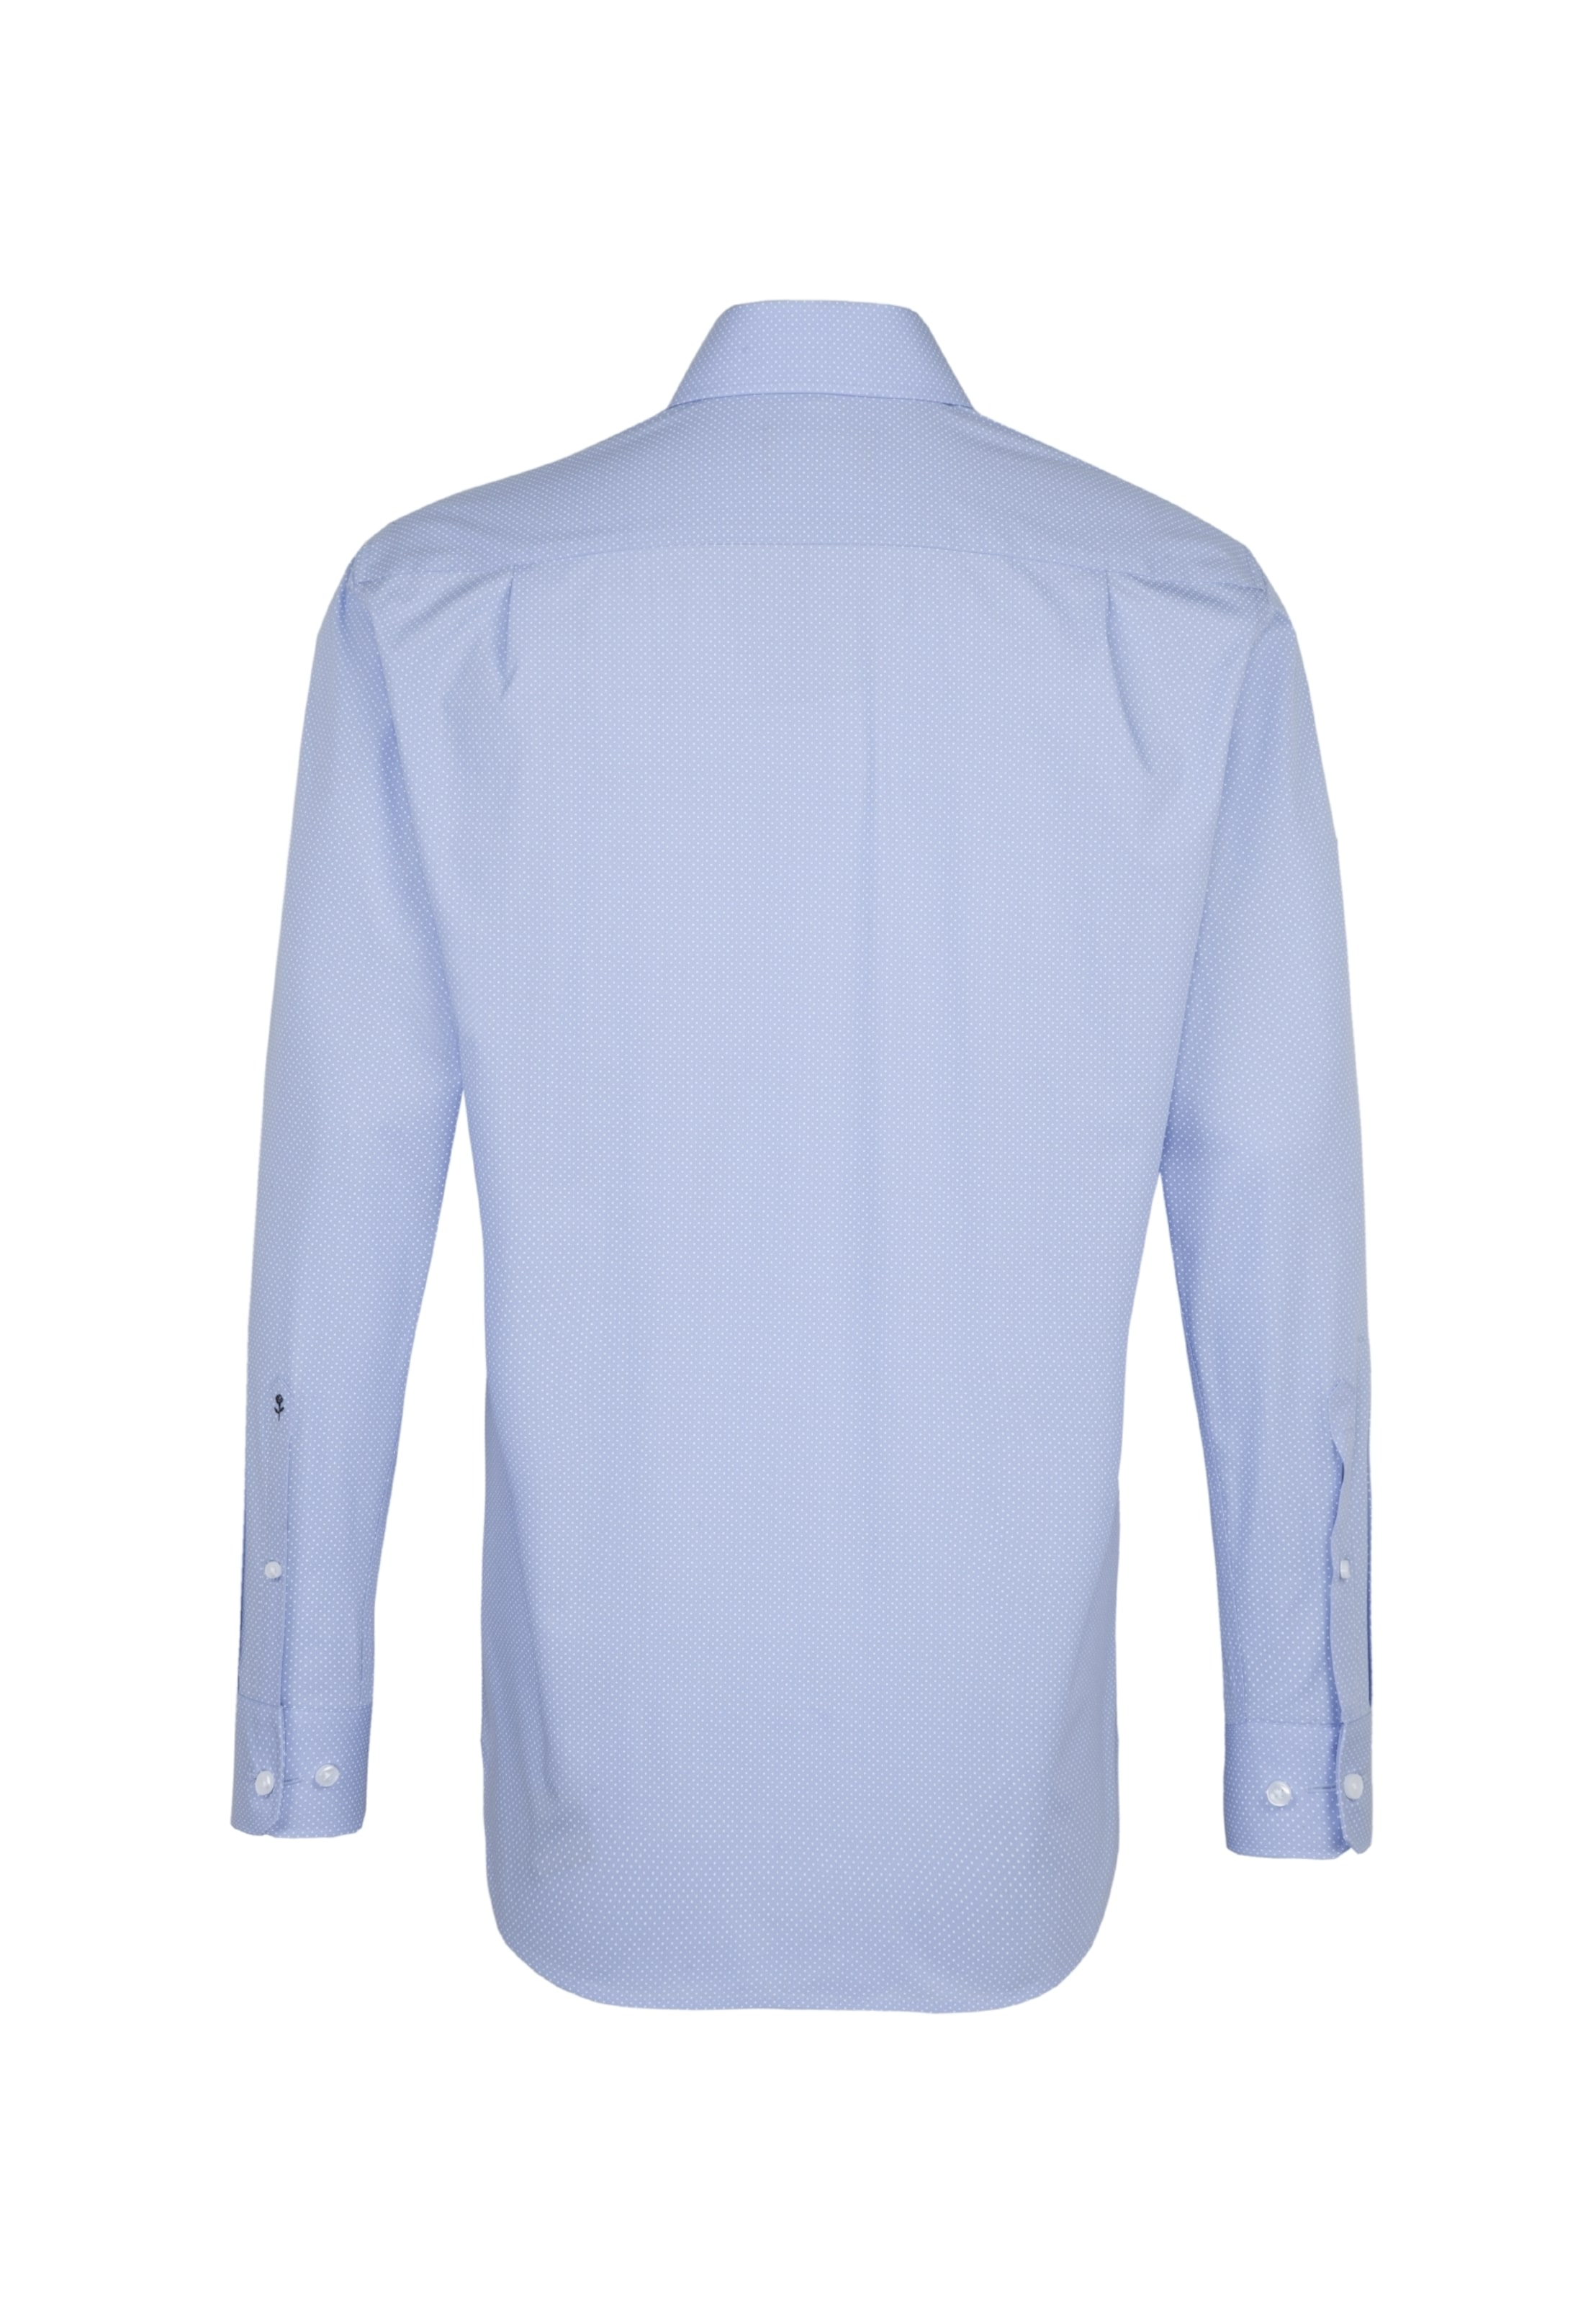 En Business Seidensticker Chemise FuméBlanc Bleu DHEe9YW2I